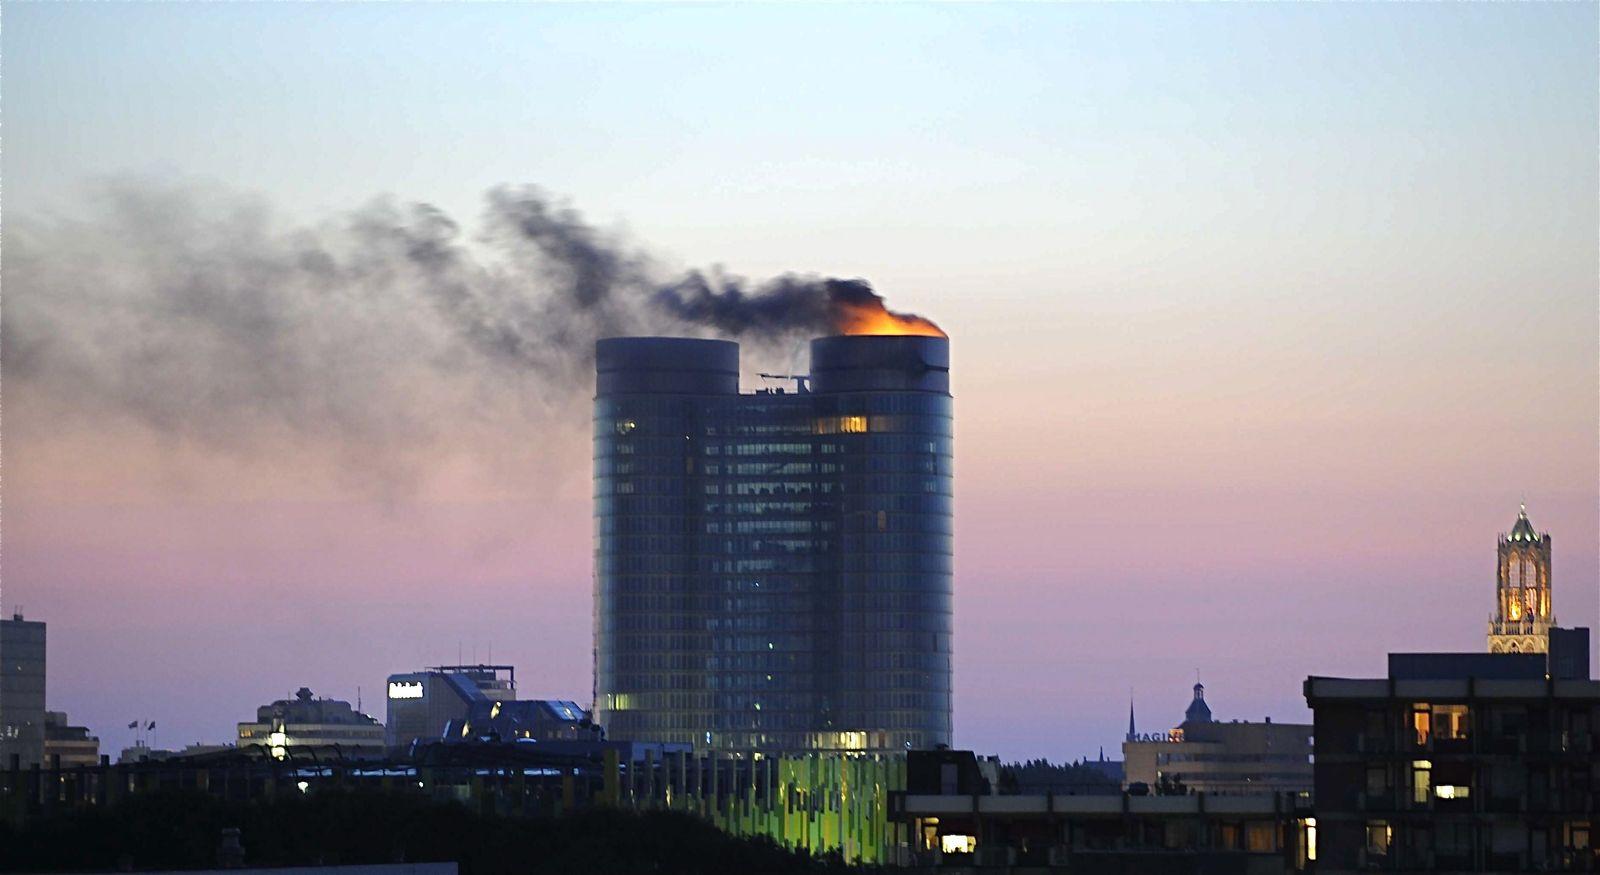 Rabobank / Explosion / Niederlande